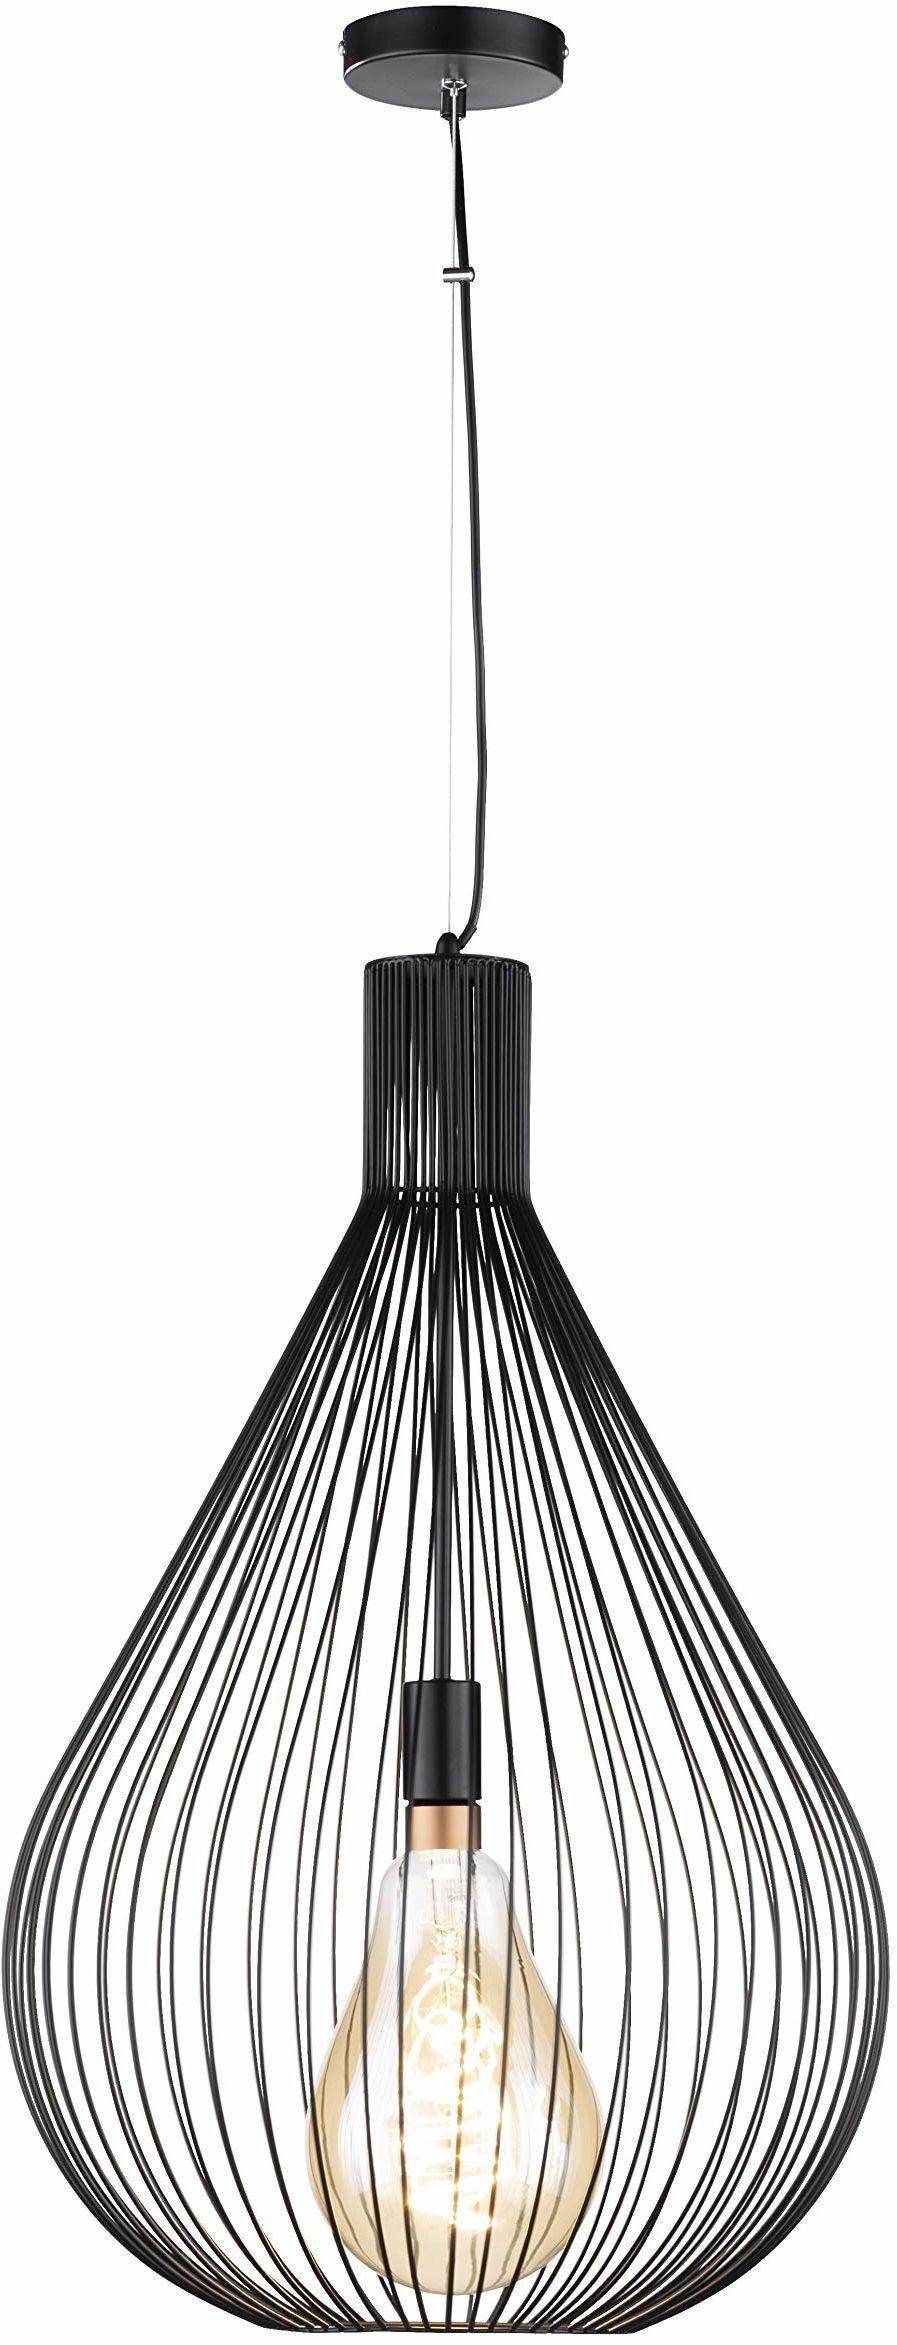 Fischer&Honsel Benett lampa wisząca, metal, 60 W, czarna